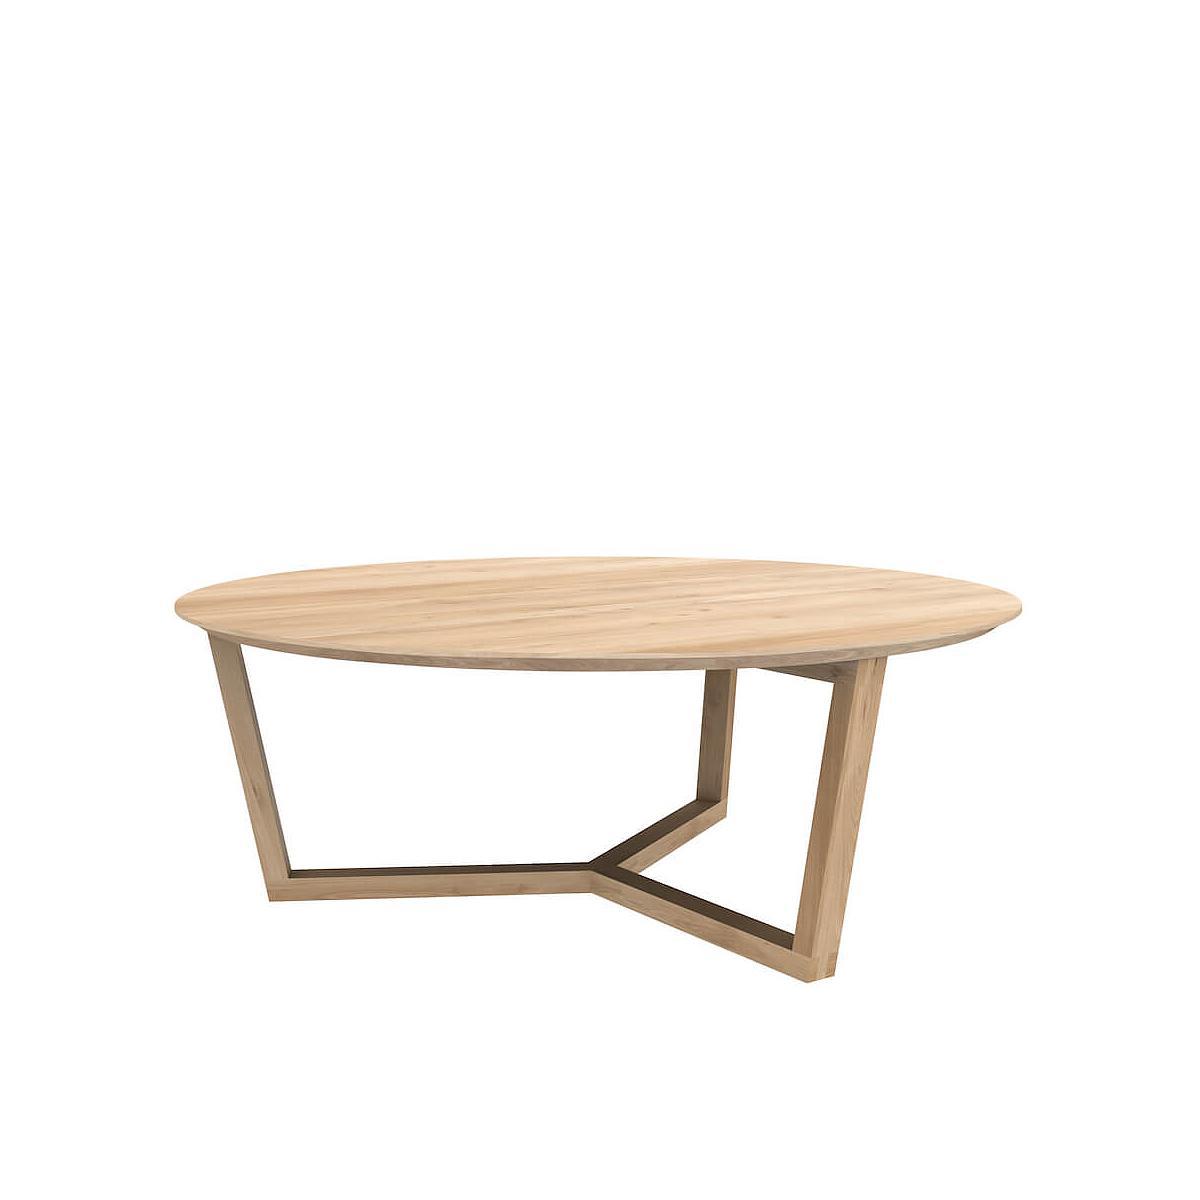 Table basse TRIPOD Ethnicraft chêne